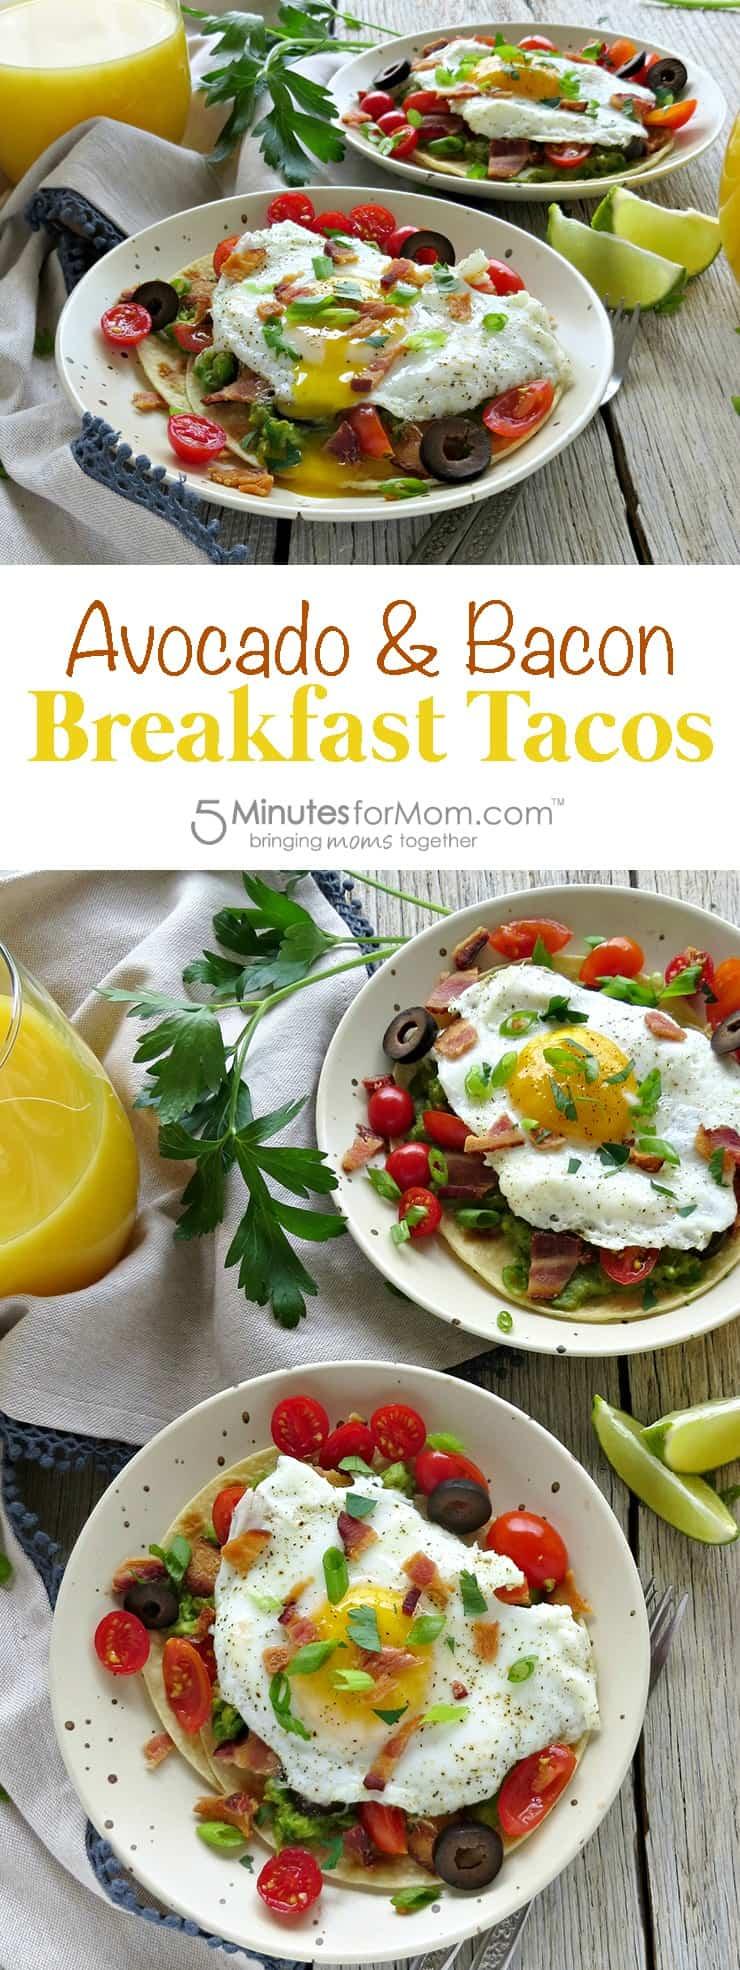 Avocado bacon breakfast tacos